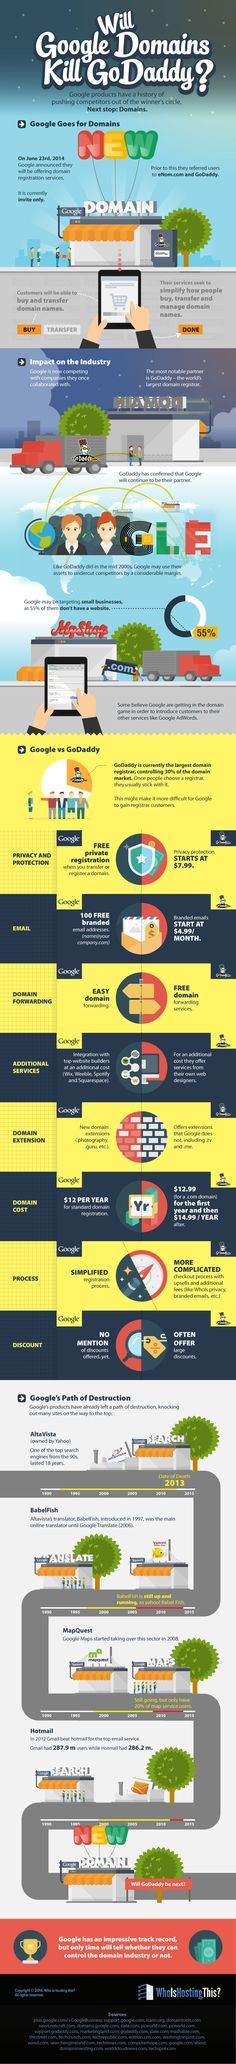 Will Google Domains Kill GoDaddy? #infographic #Domains #Google